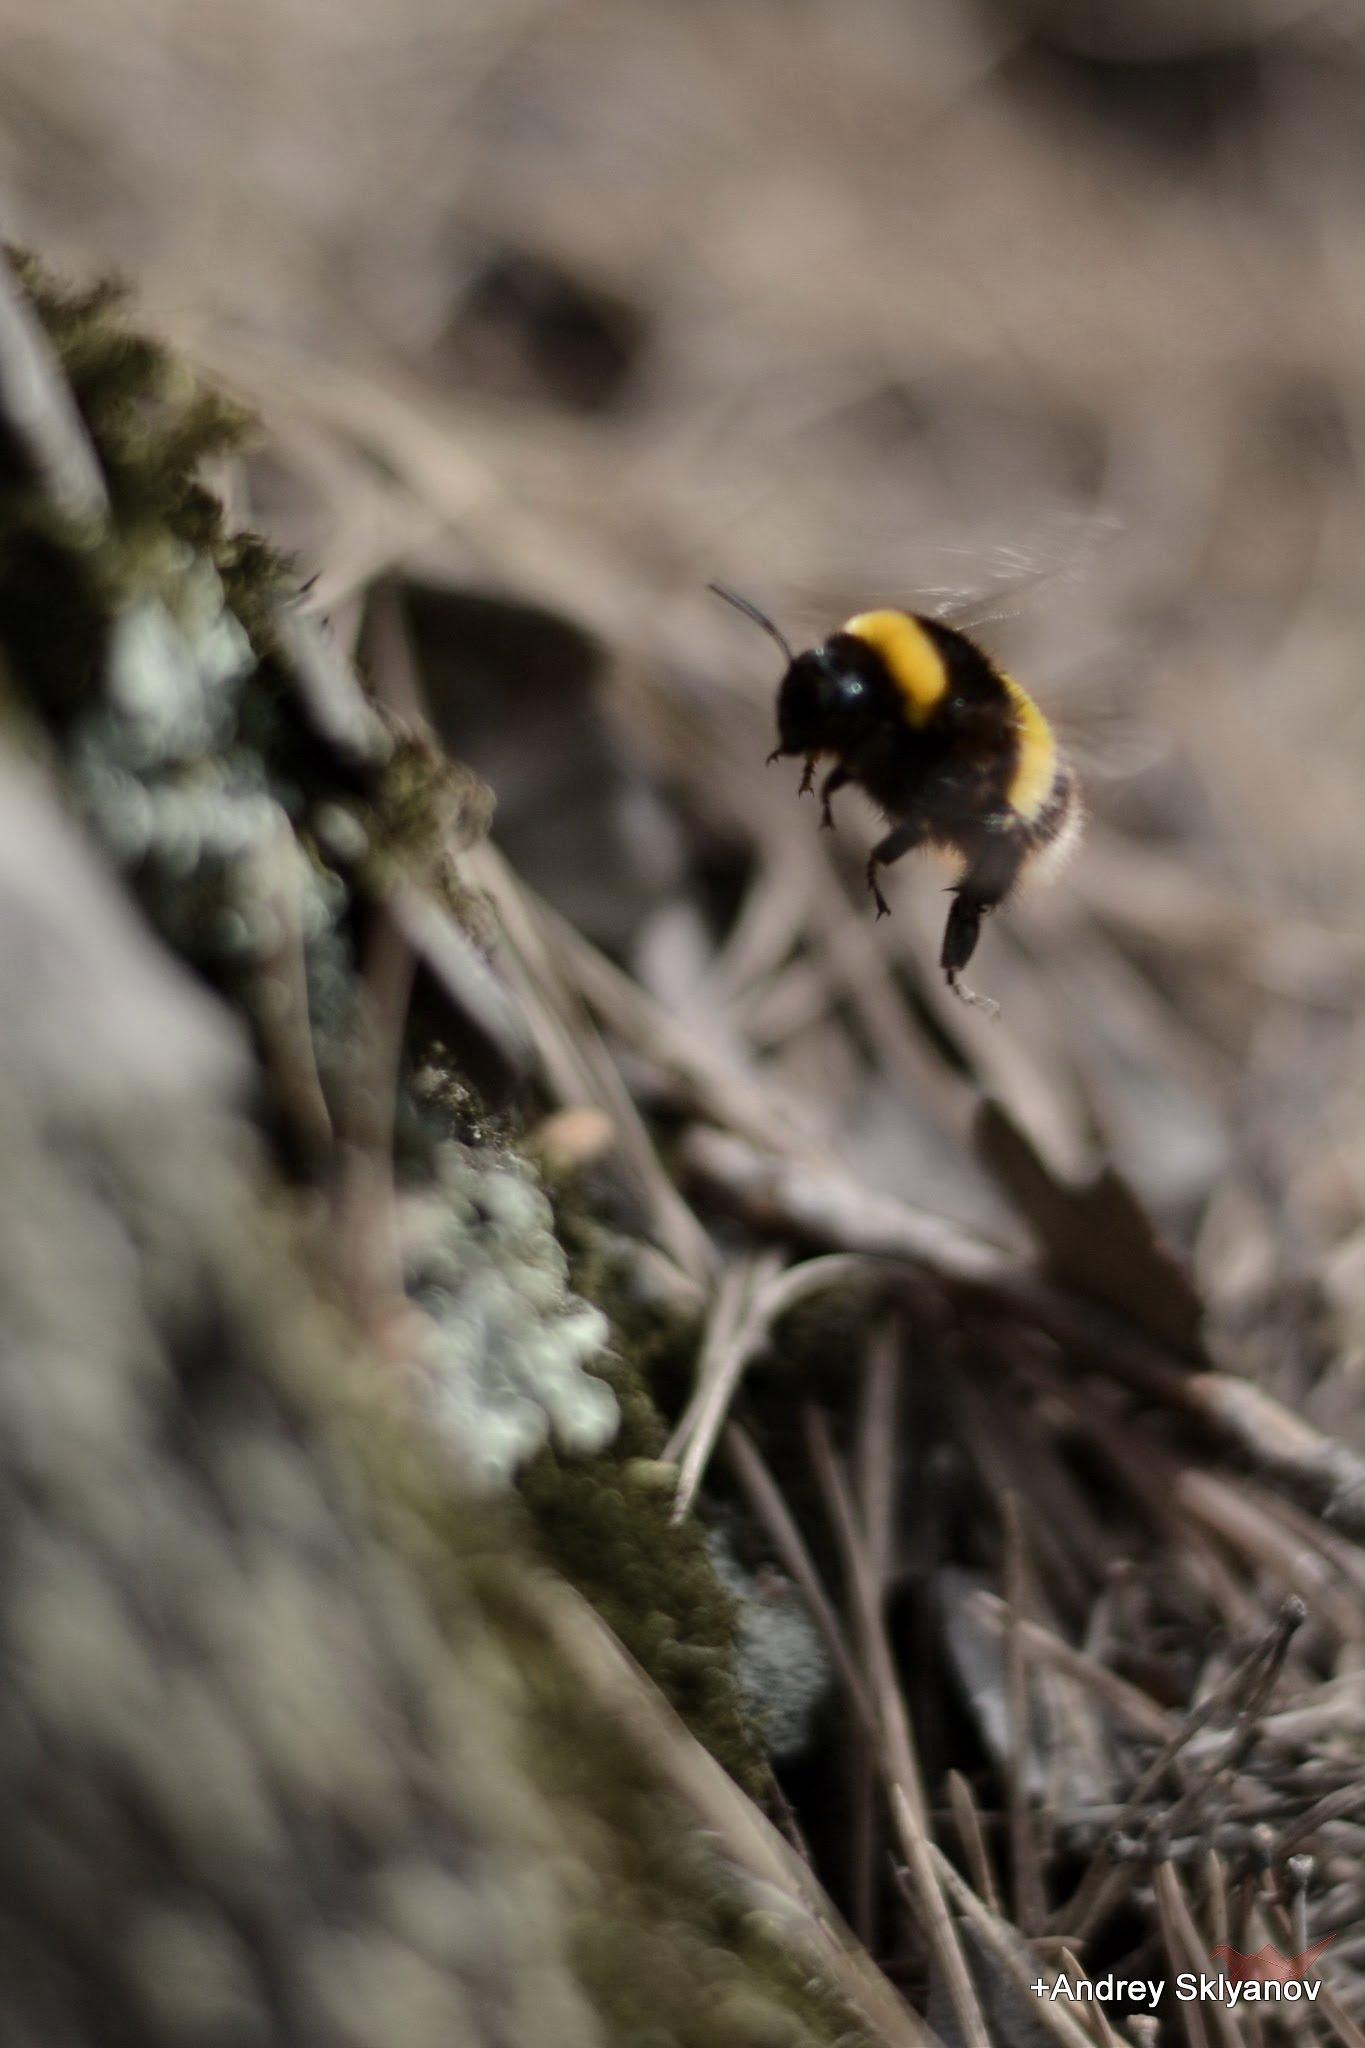 Little bumblebee by Andrey Sklyanov